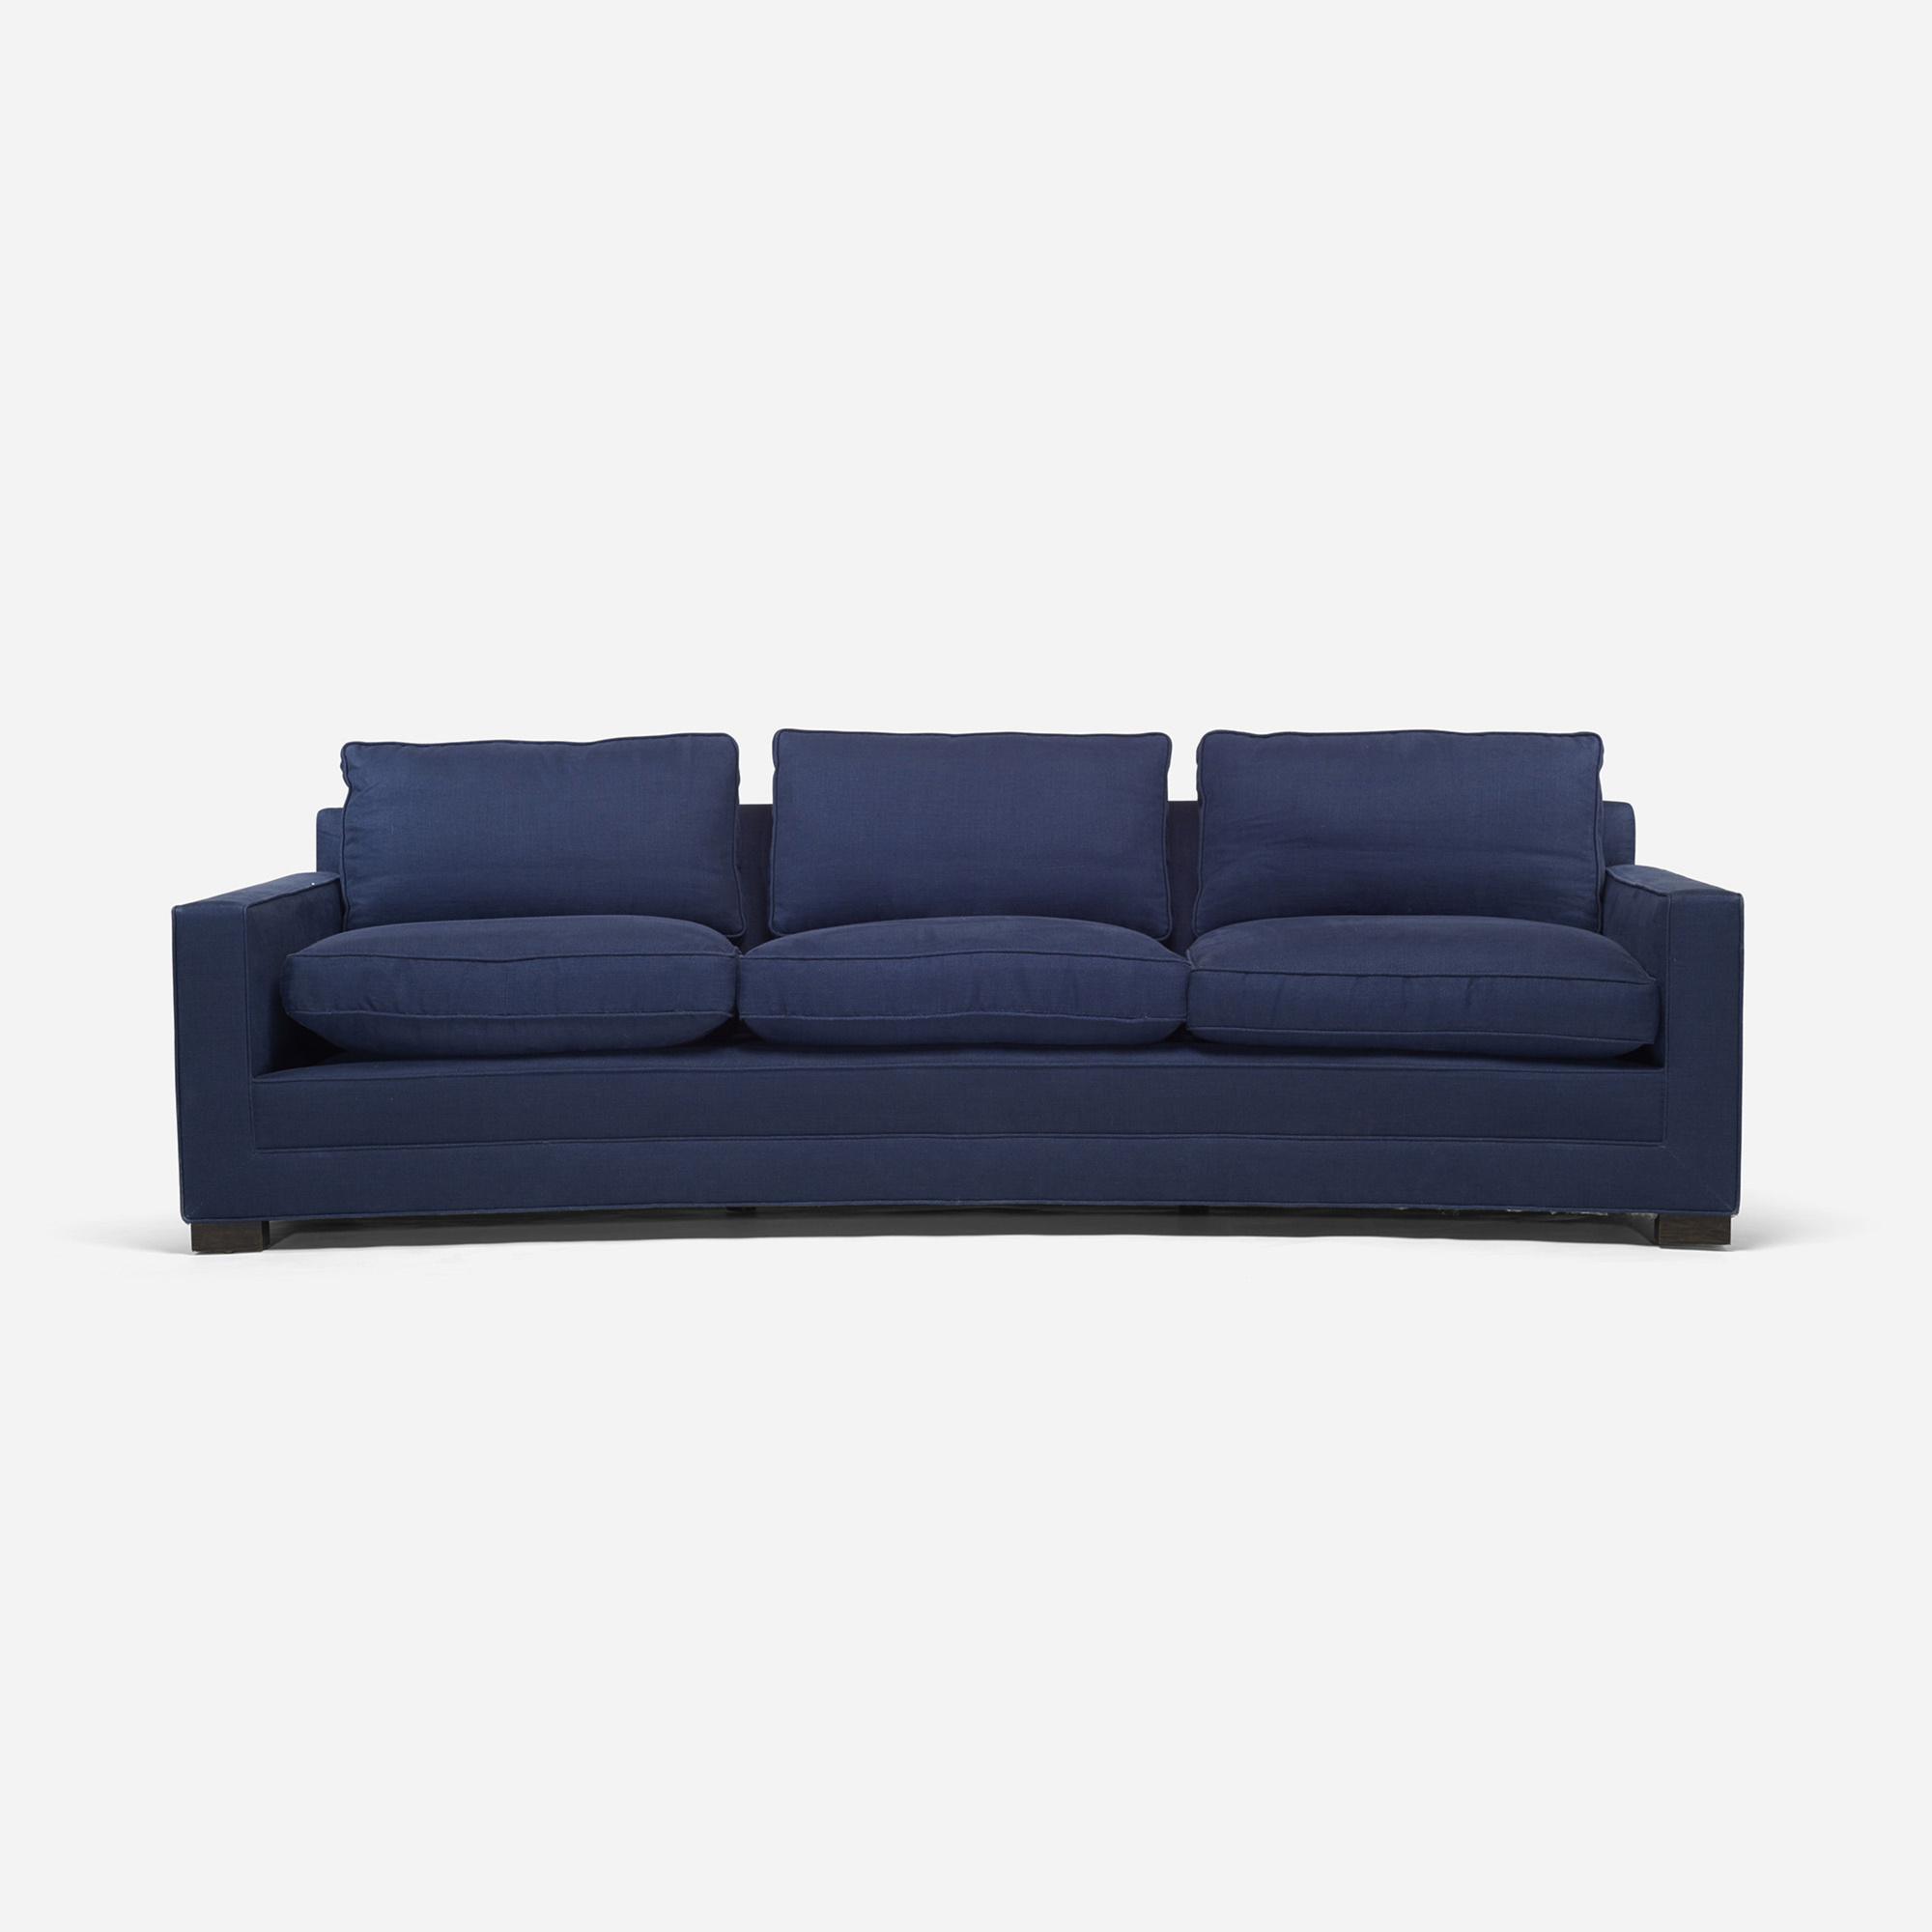 577: Modern / sofa (2 of 3)